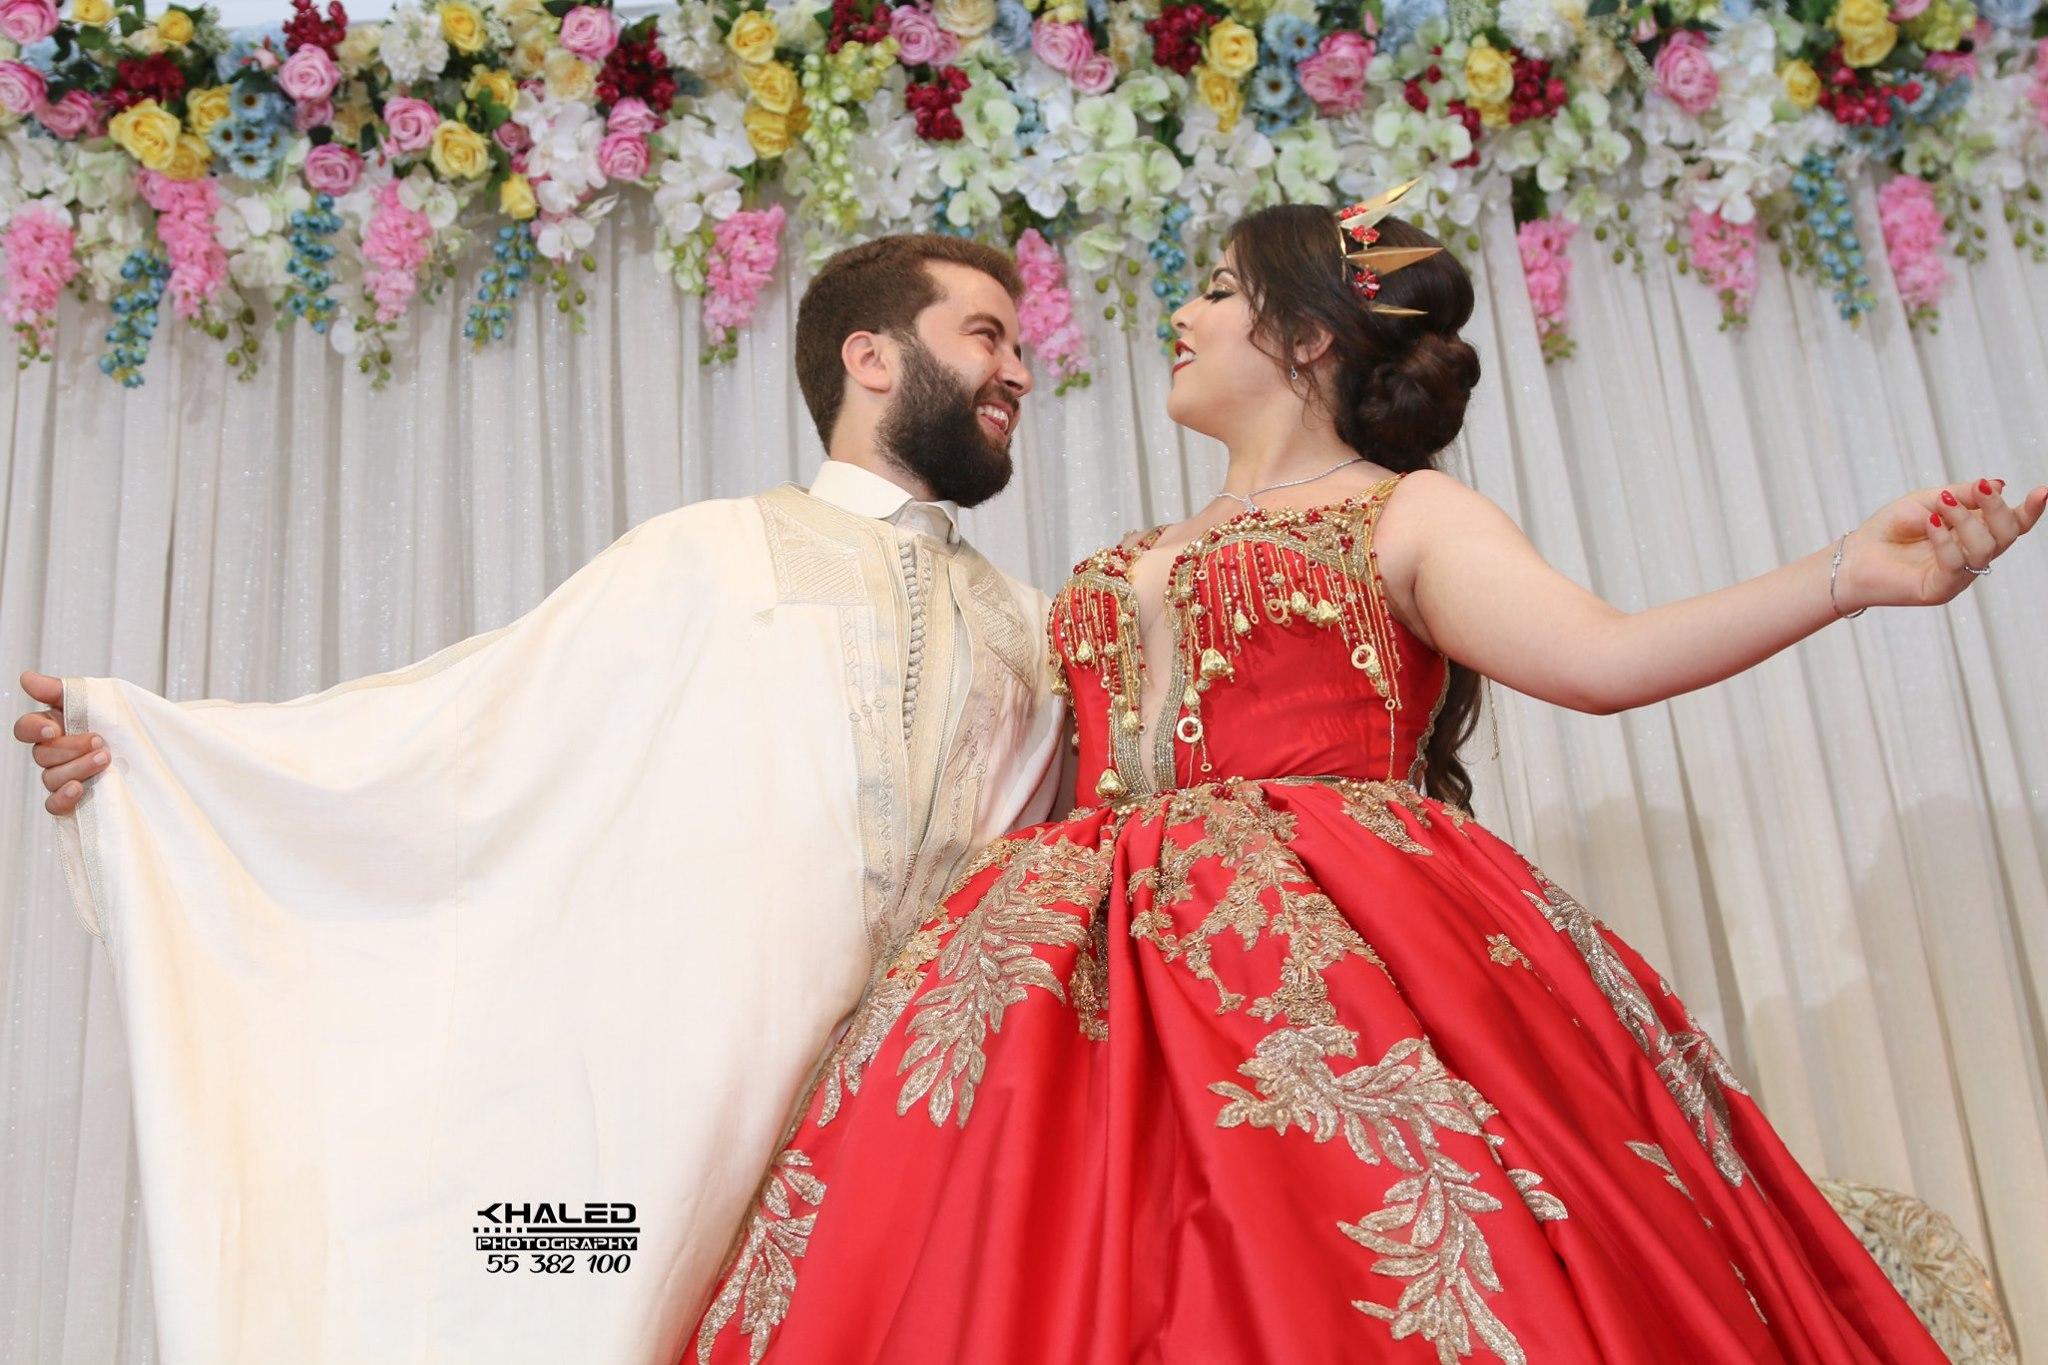 fida34_plus_belles_mariées_tunisiennes_186_2019